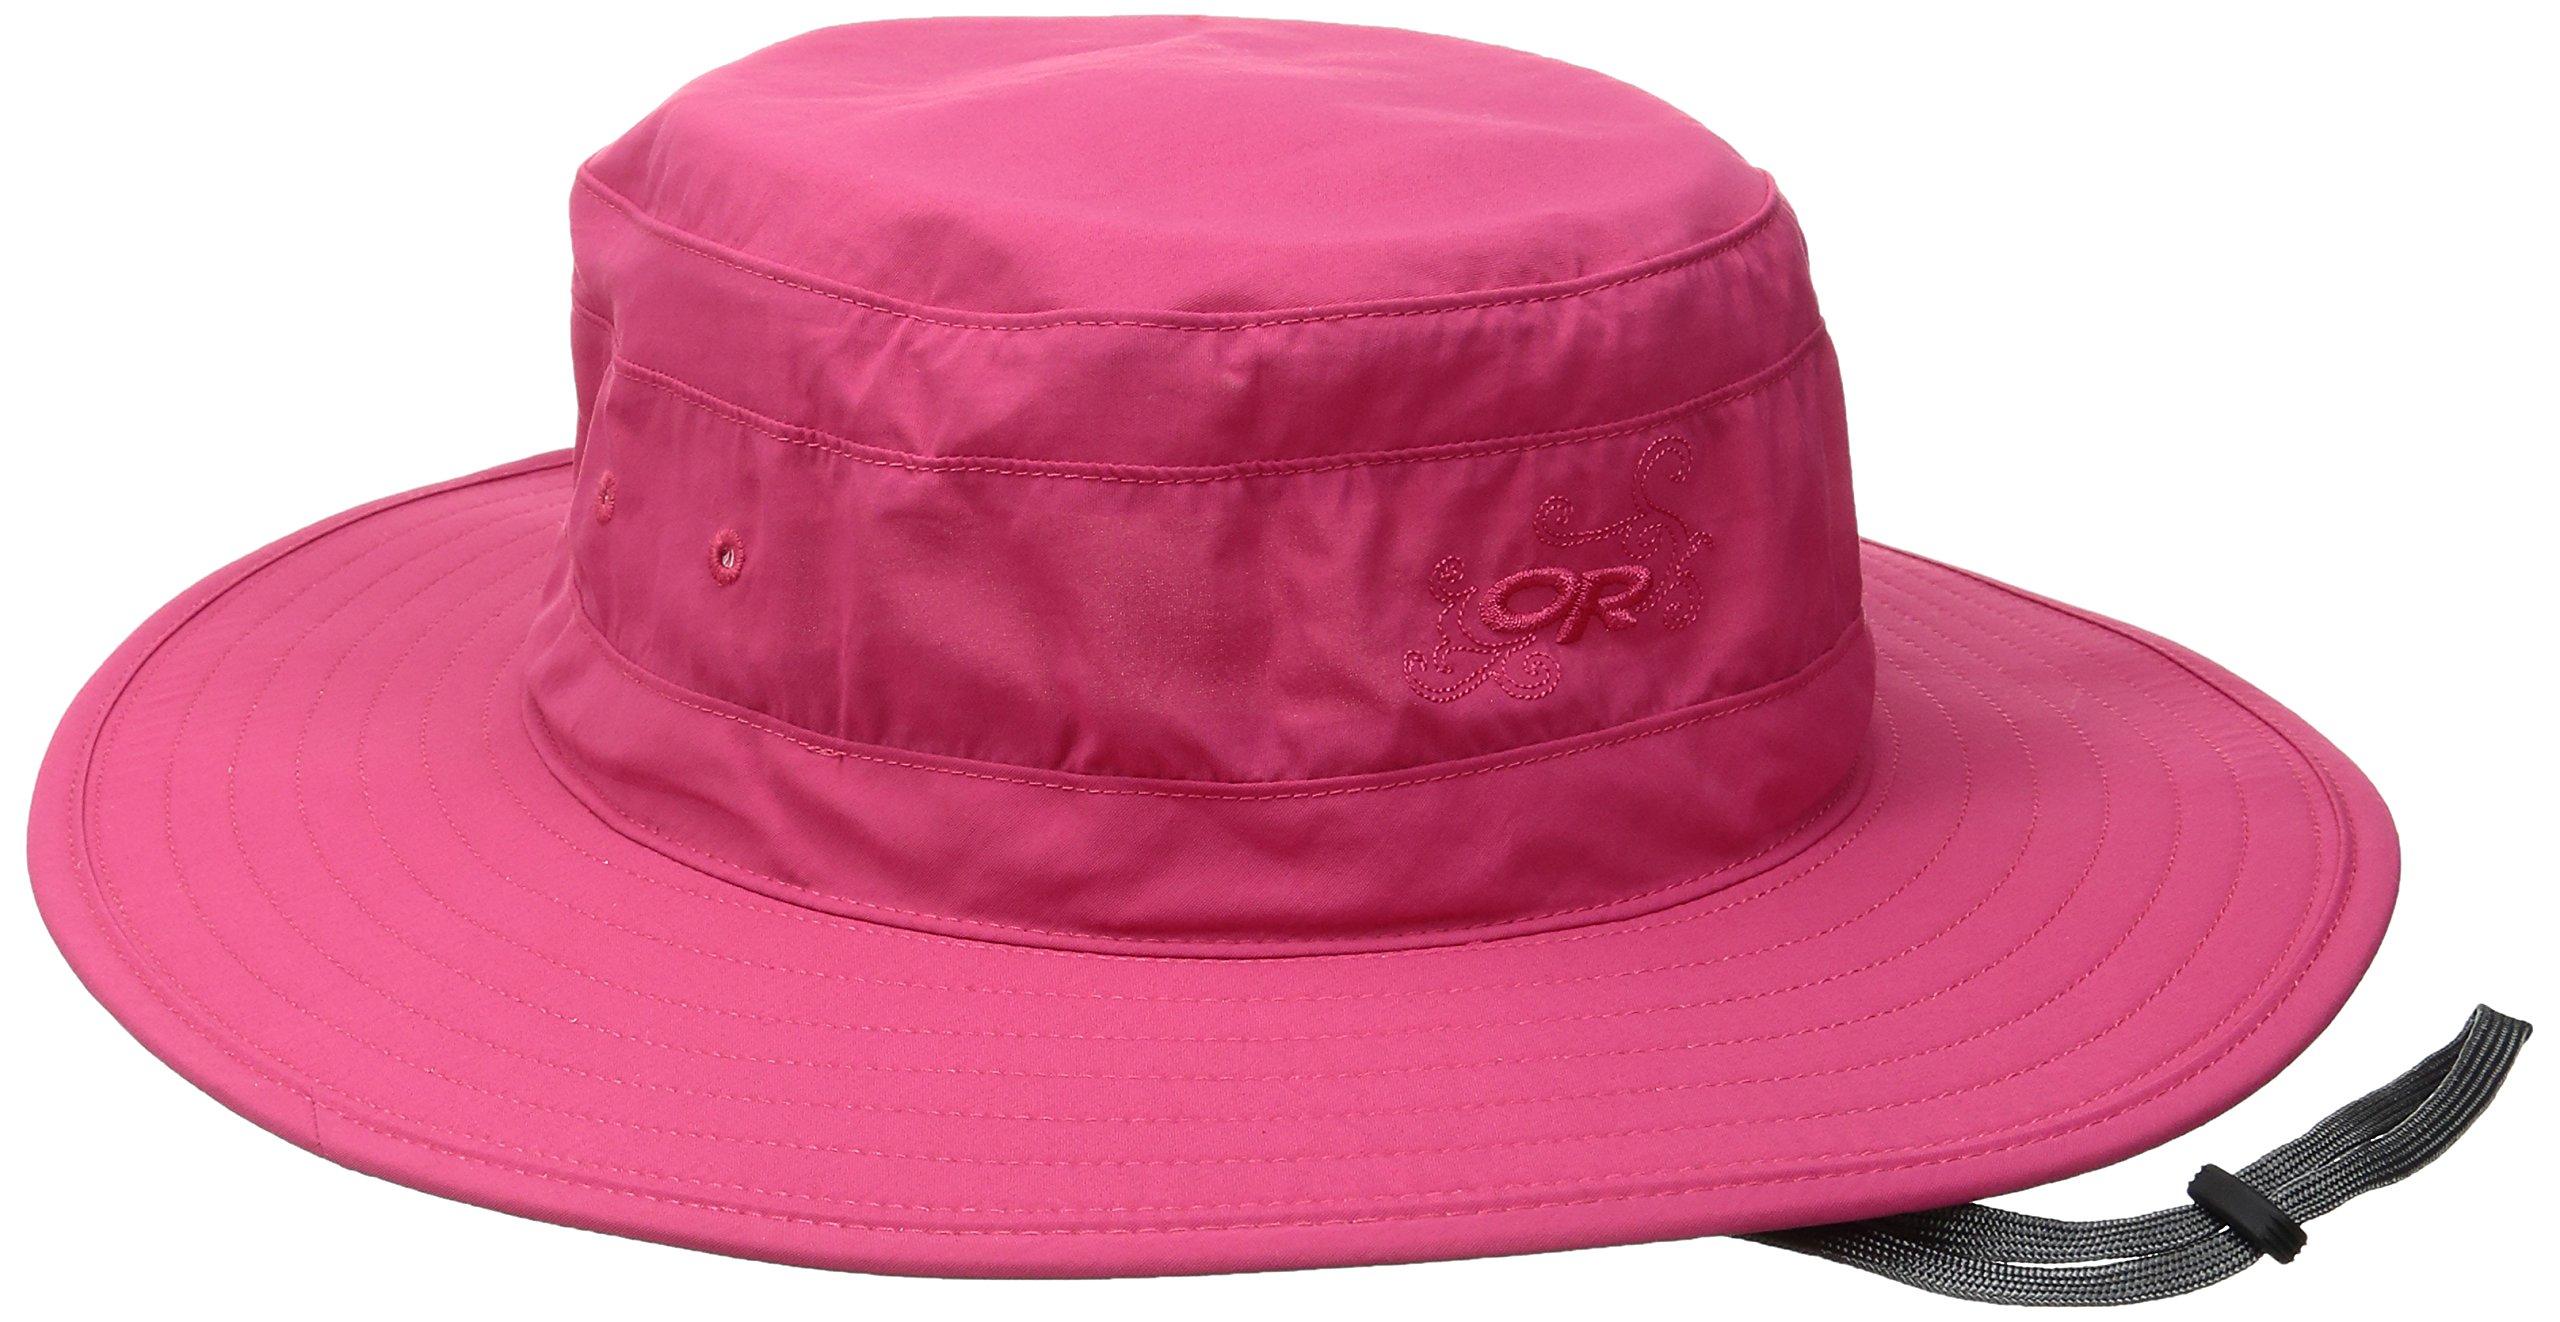 4cb39af74f2 Outdoor Research Women s Solar Roller Sun Hat